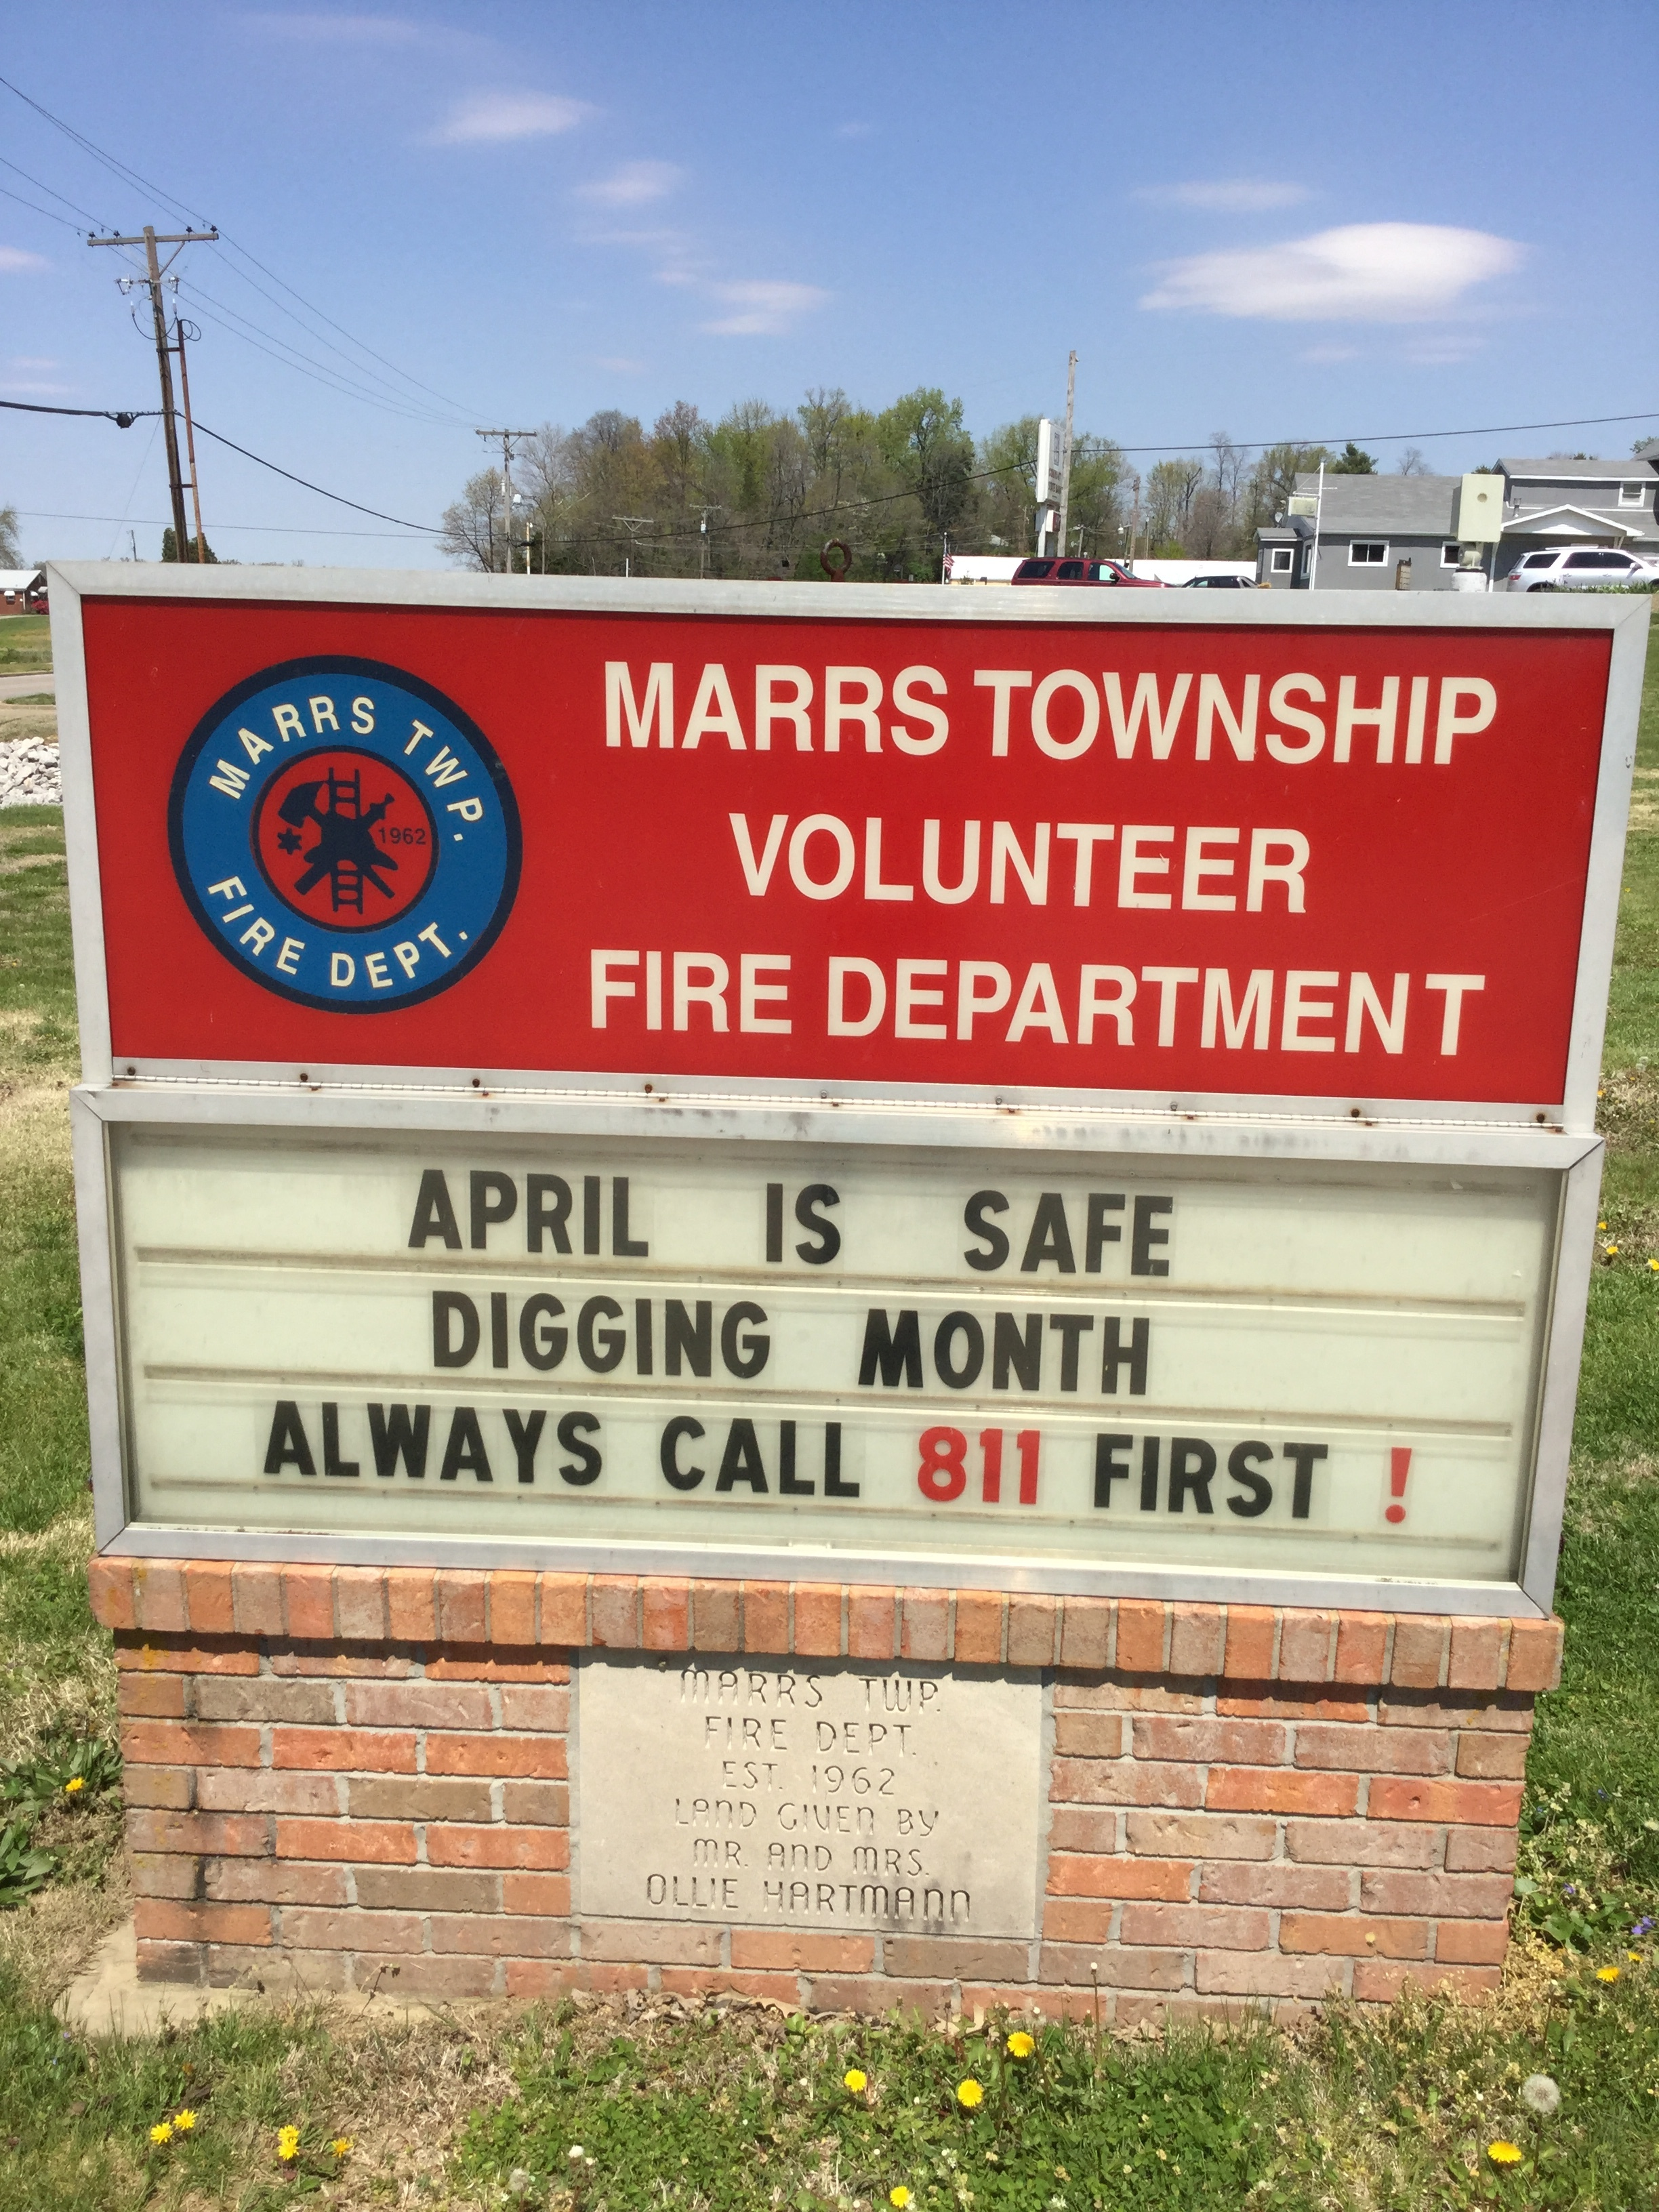 Marrs Township Volunteer Fire Department